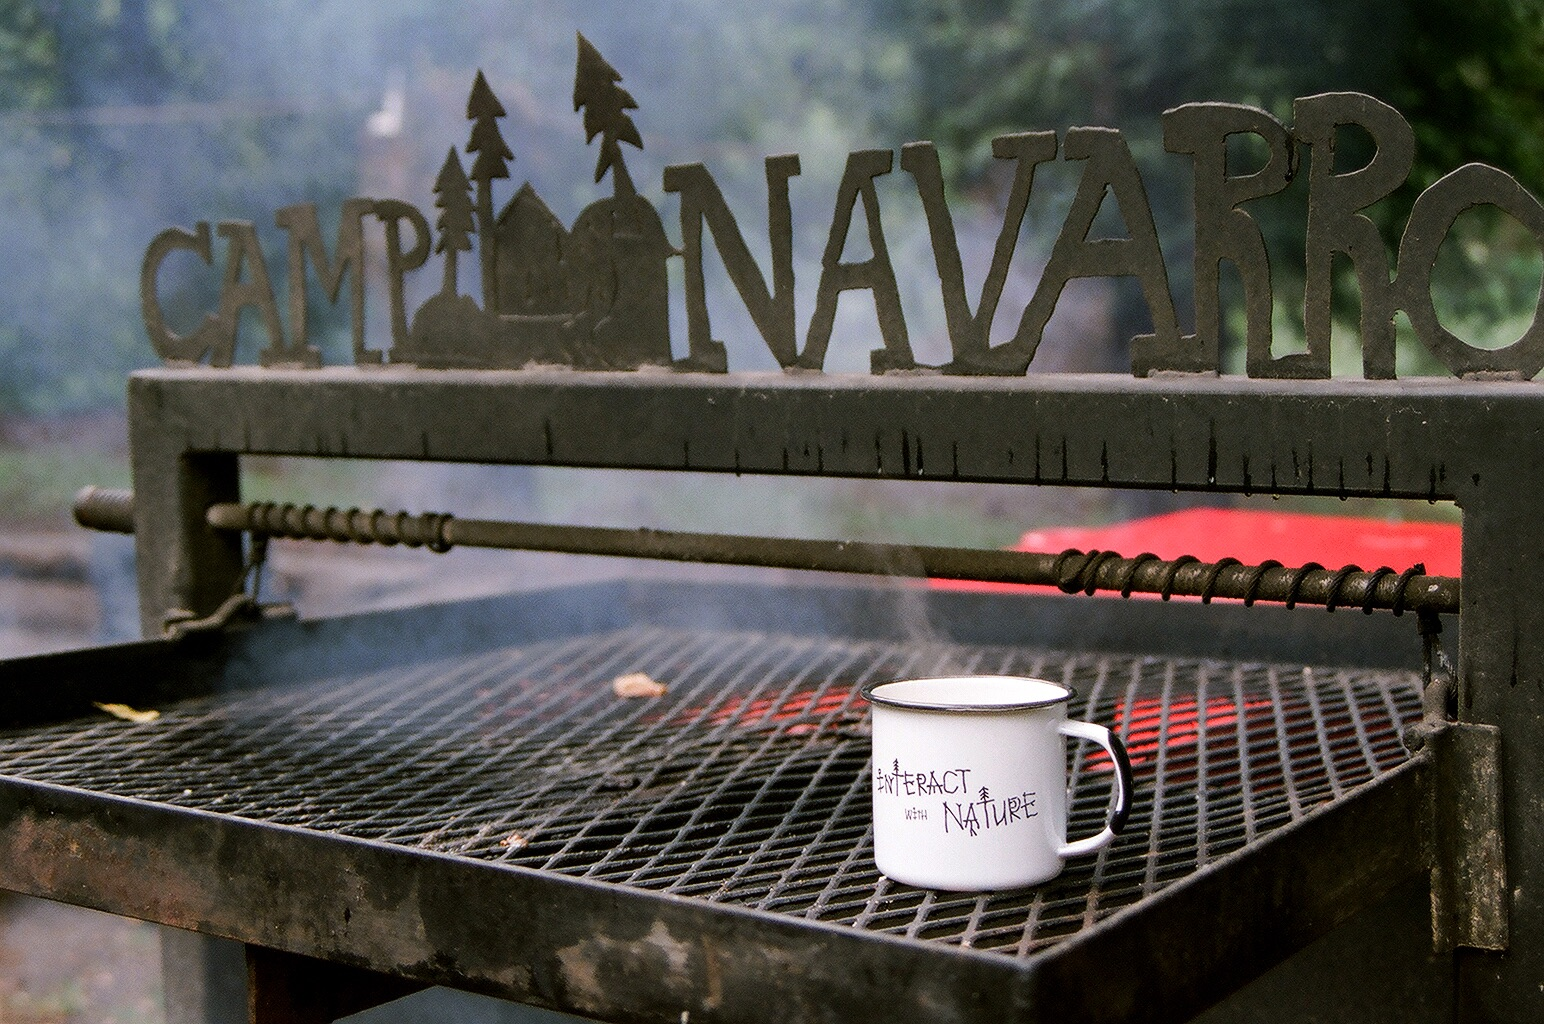 Camp Navarro Grill